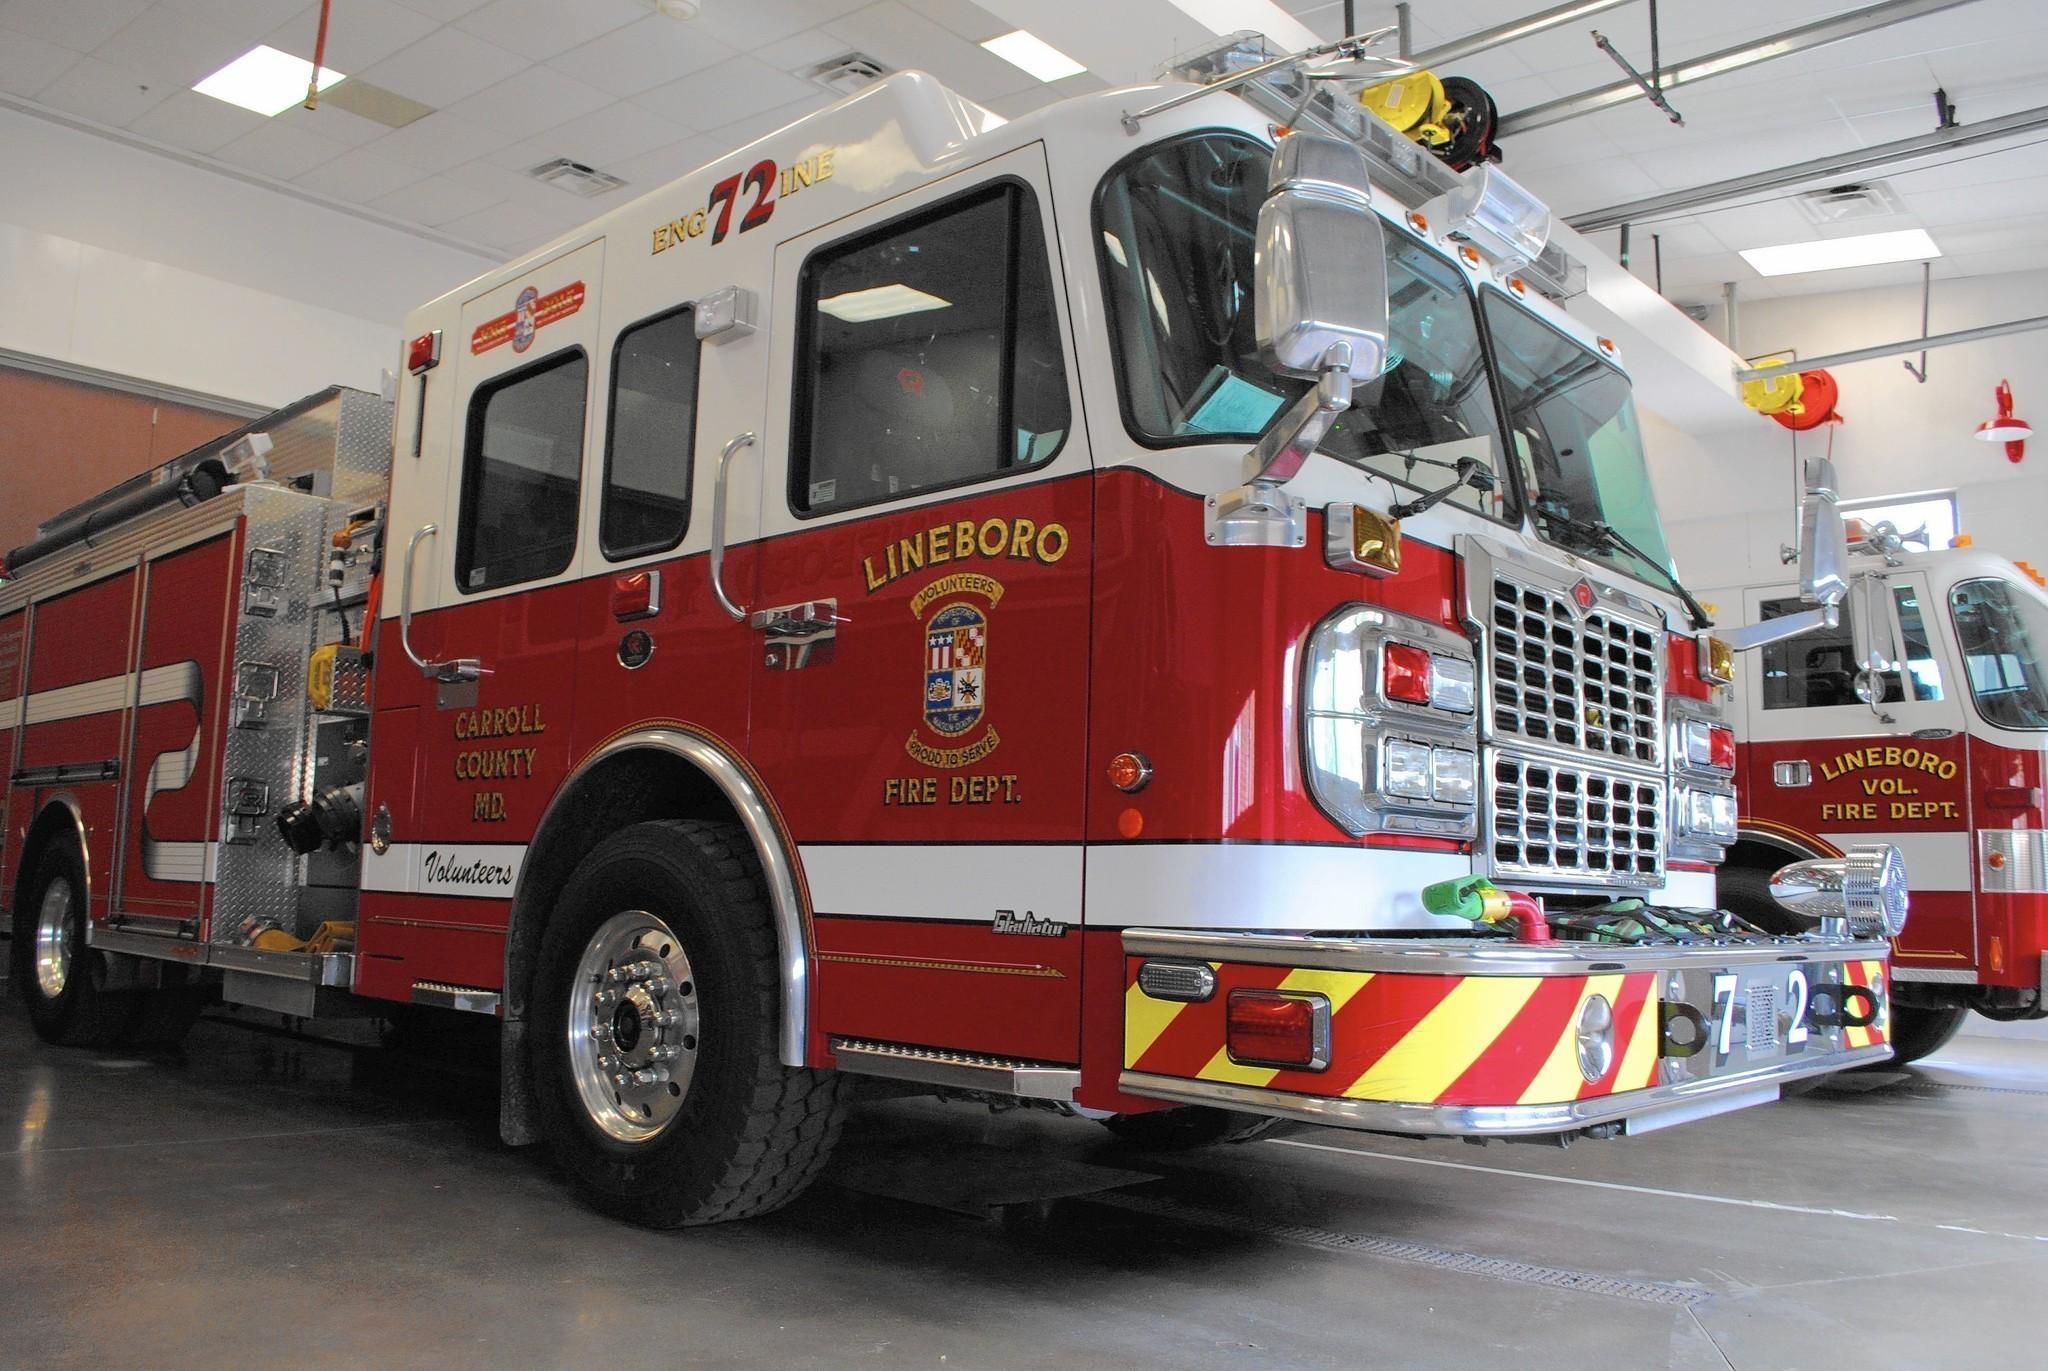 Lineboro fire company celebrates 100th anniversary - Carroll County